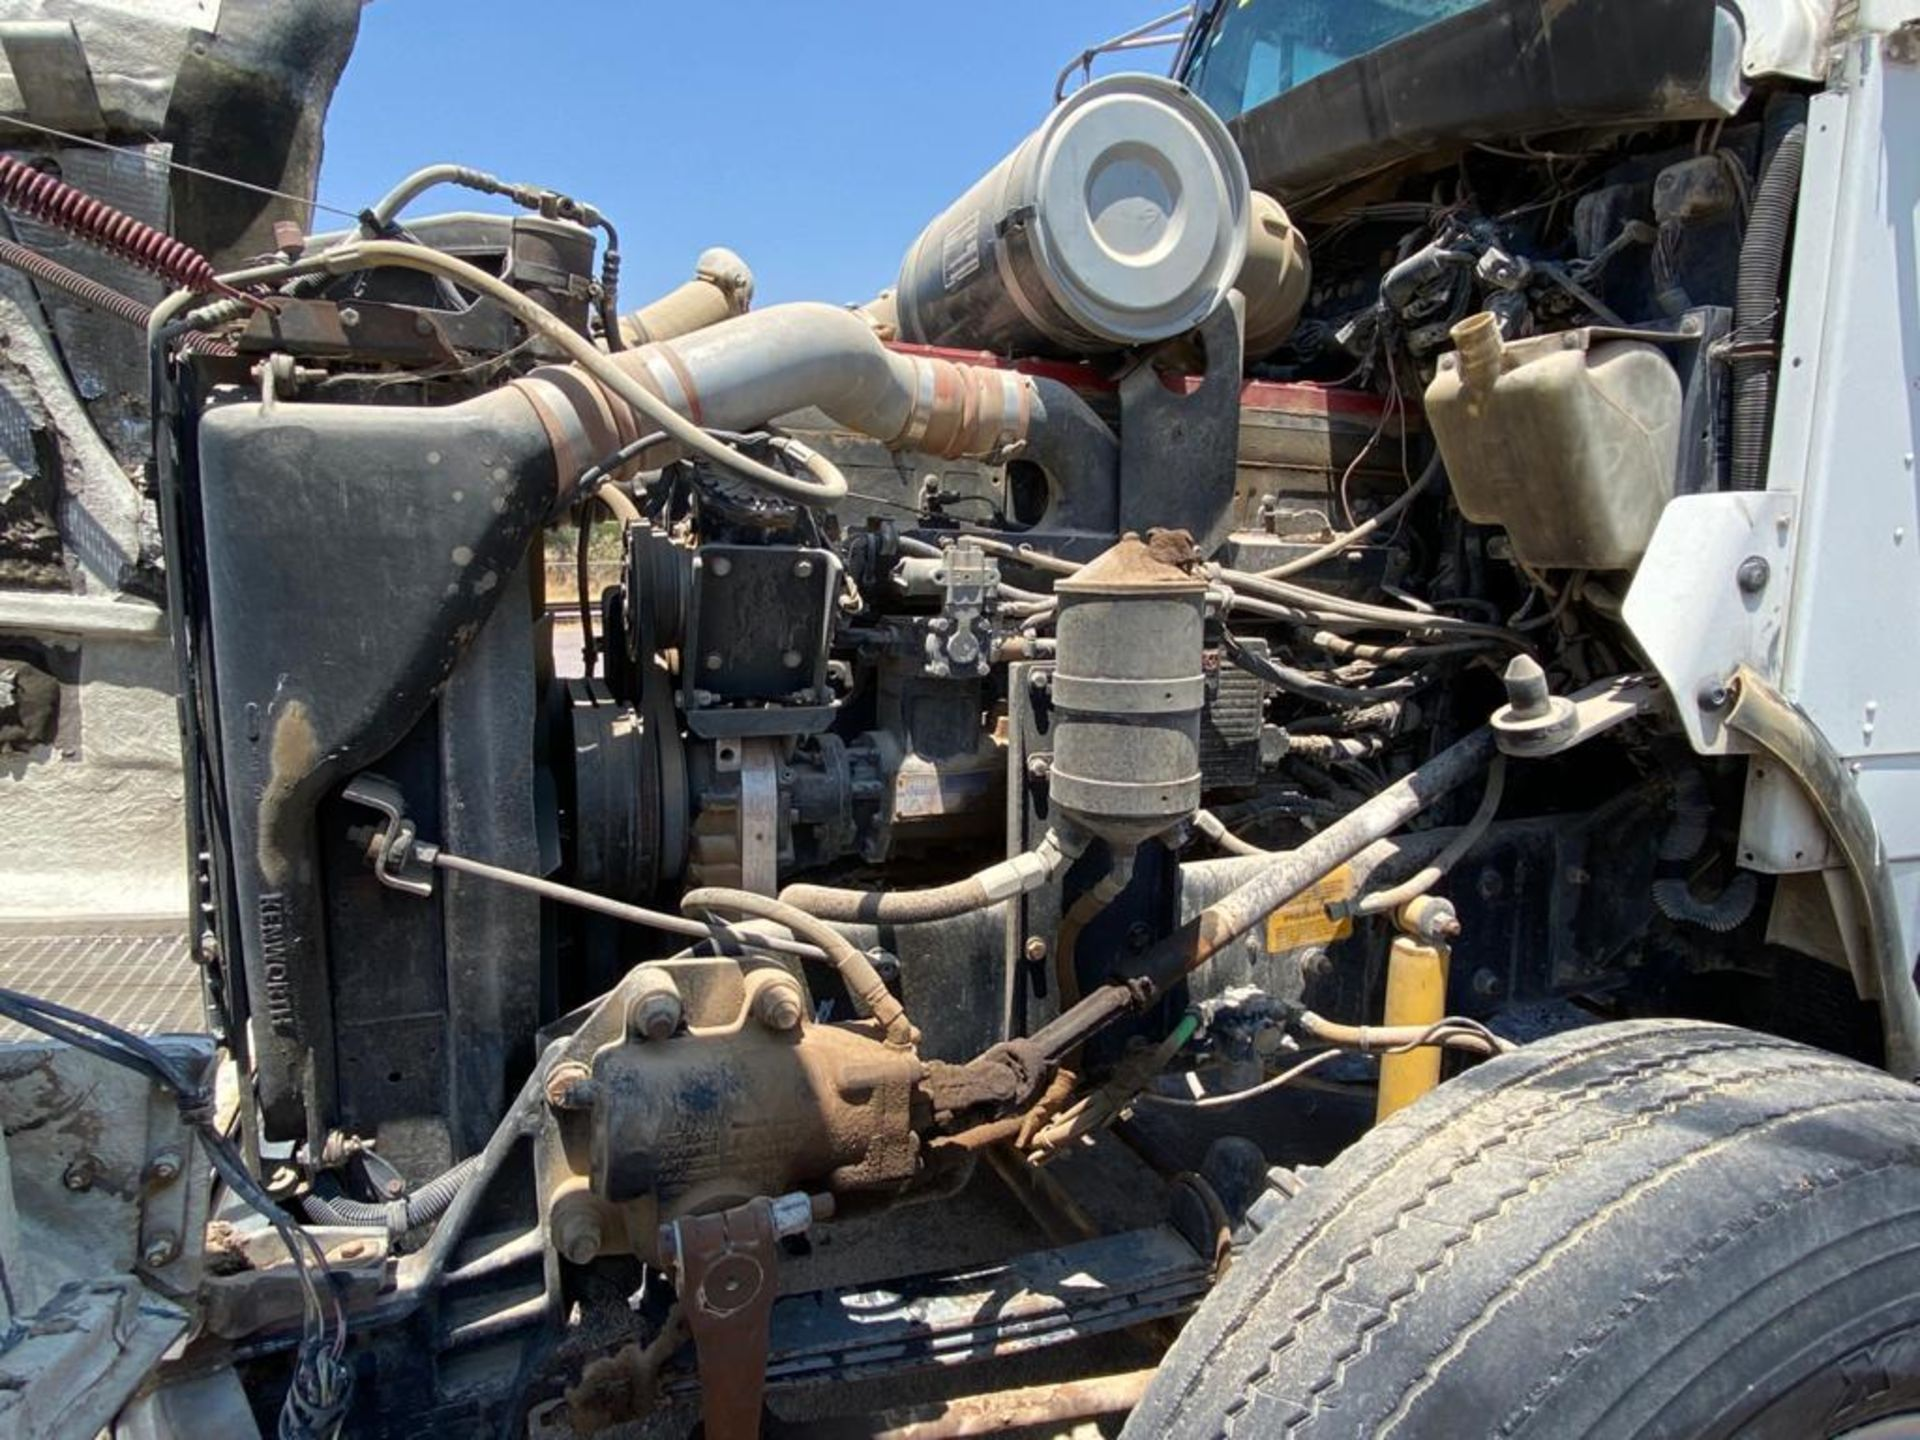 1998 Kenworth 5000 Gallon, standard transmission of 16 speeds - Image 53 of 68